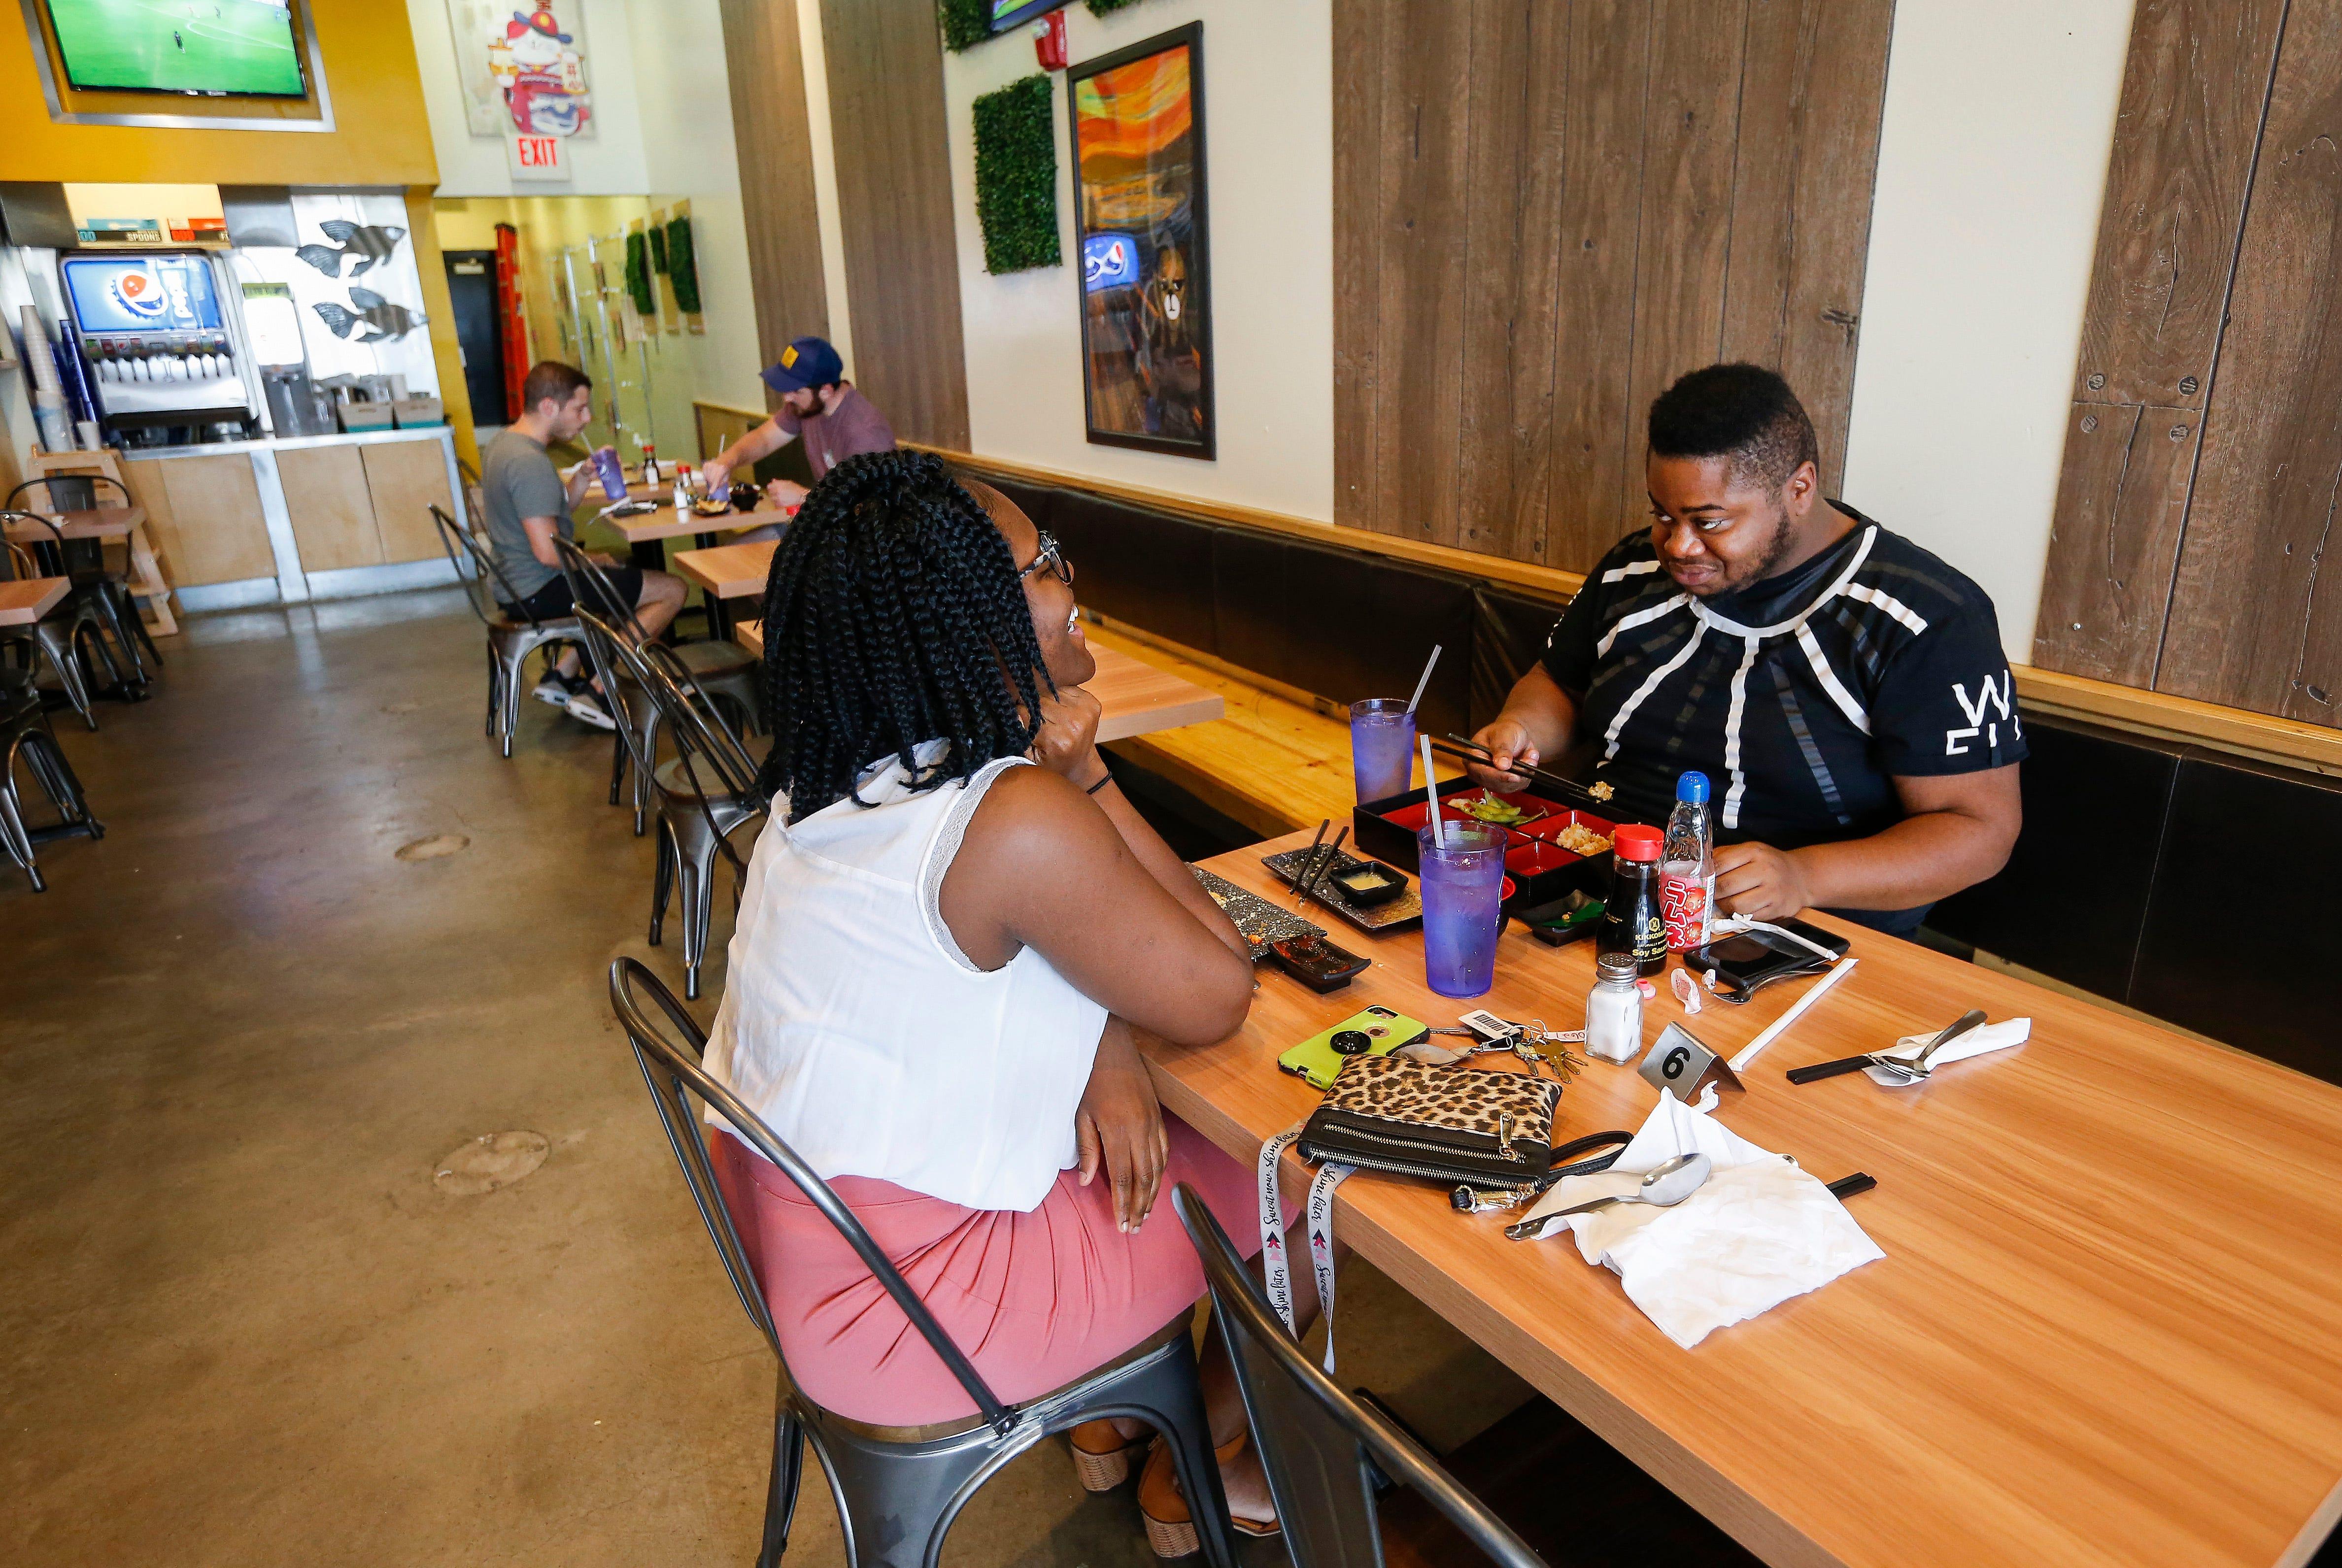 Customers enjoy lunch at Kuma Japanese Ramen & Sushi, located at 3405 E. Battlefield Road,  on Monday, Oct. 1, 2018.